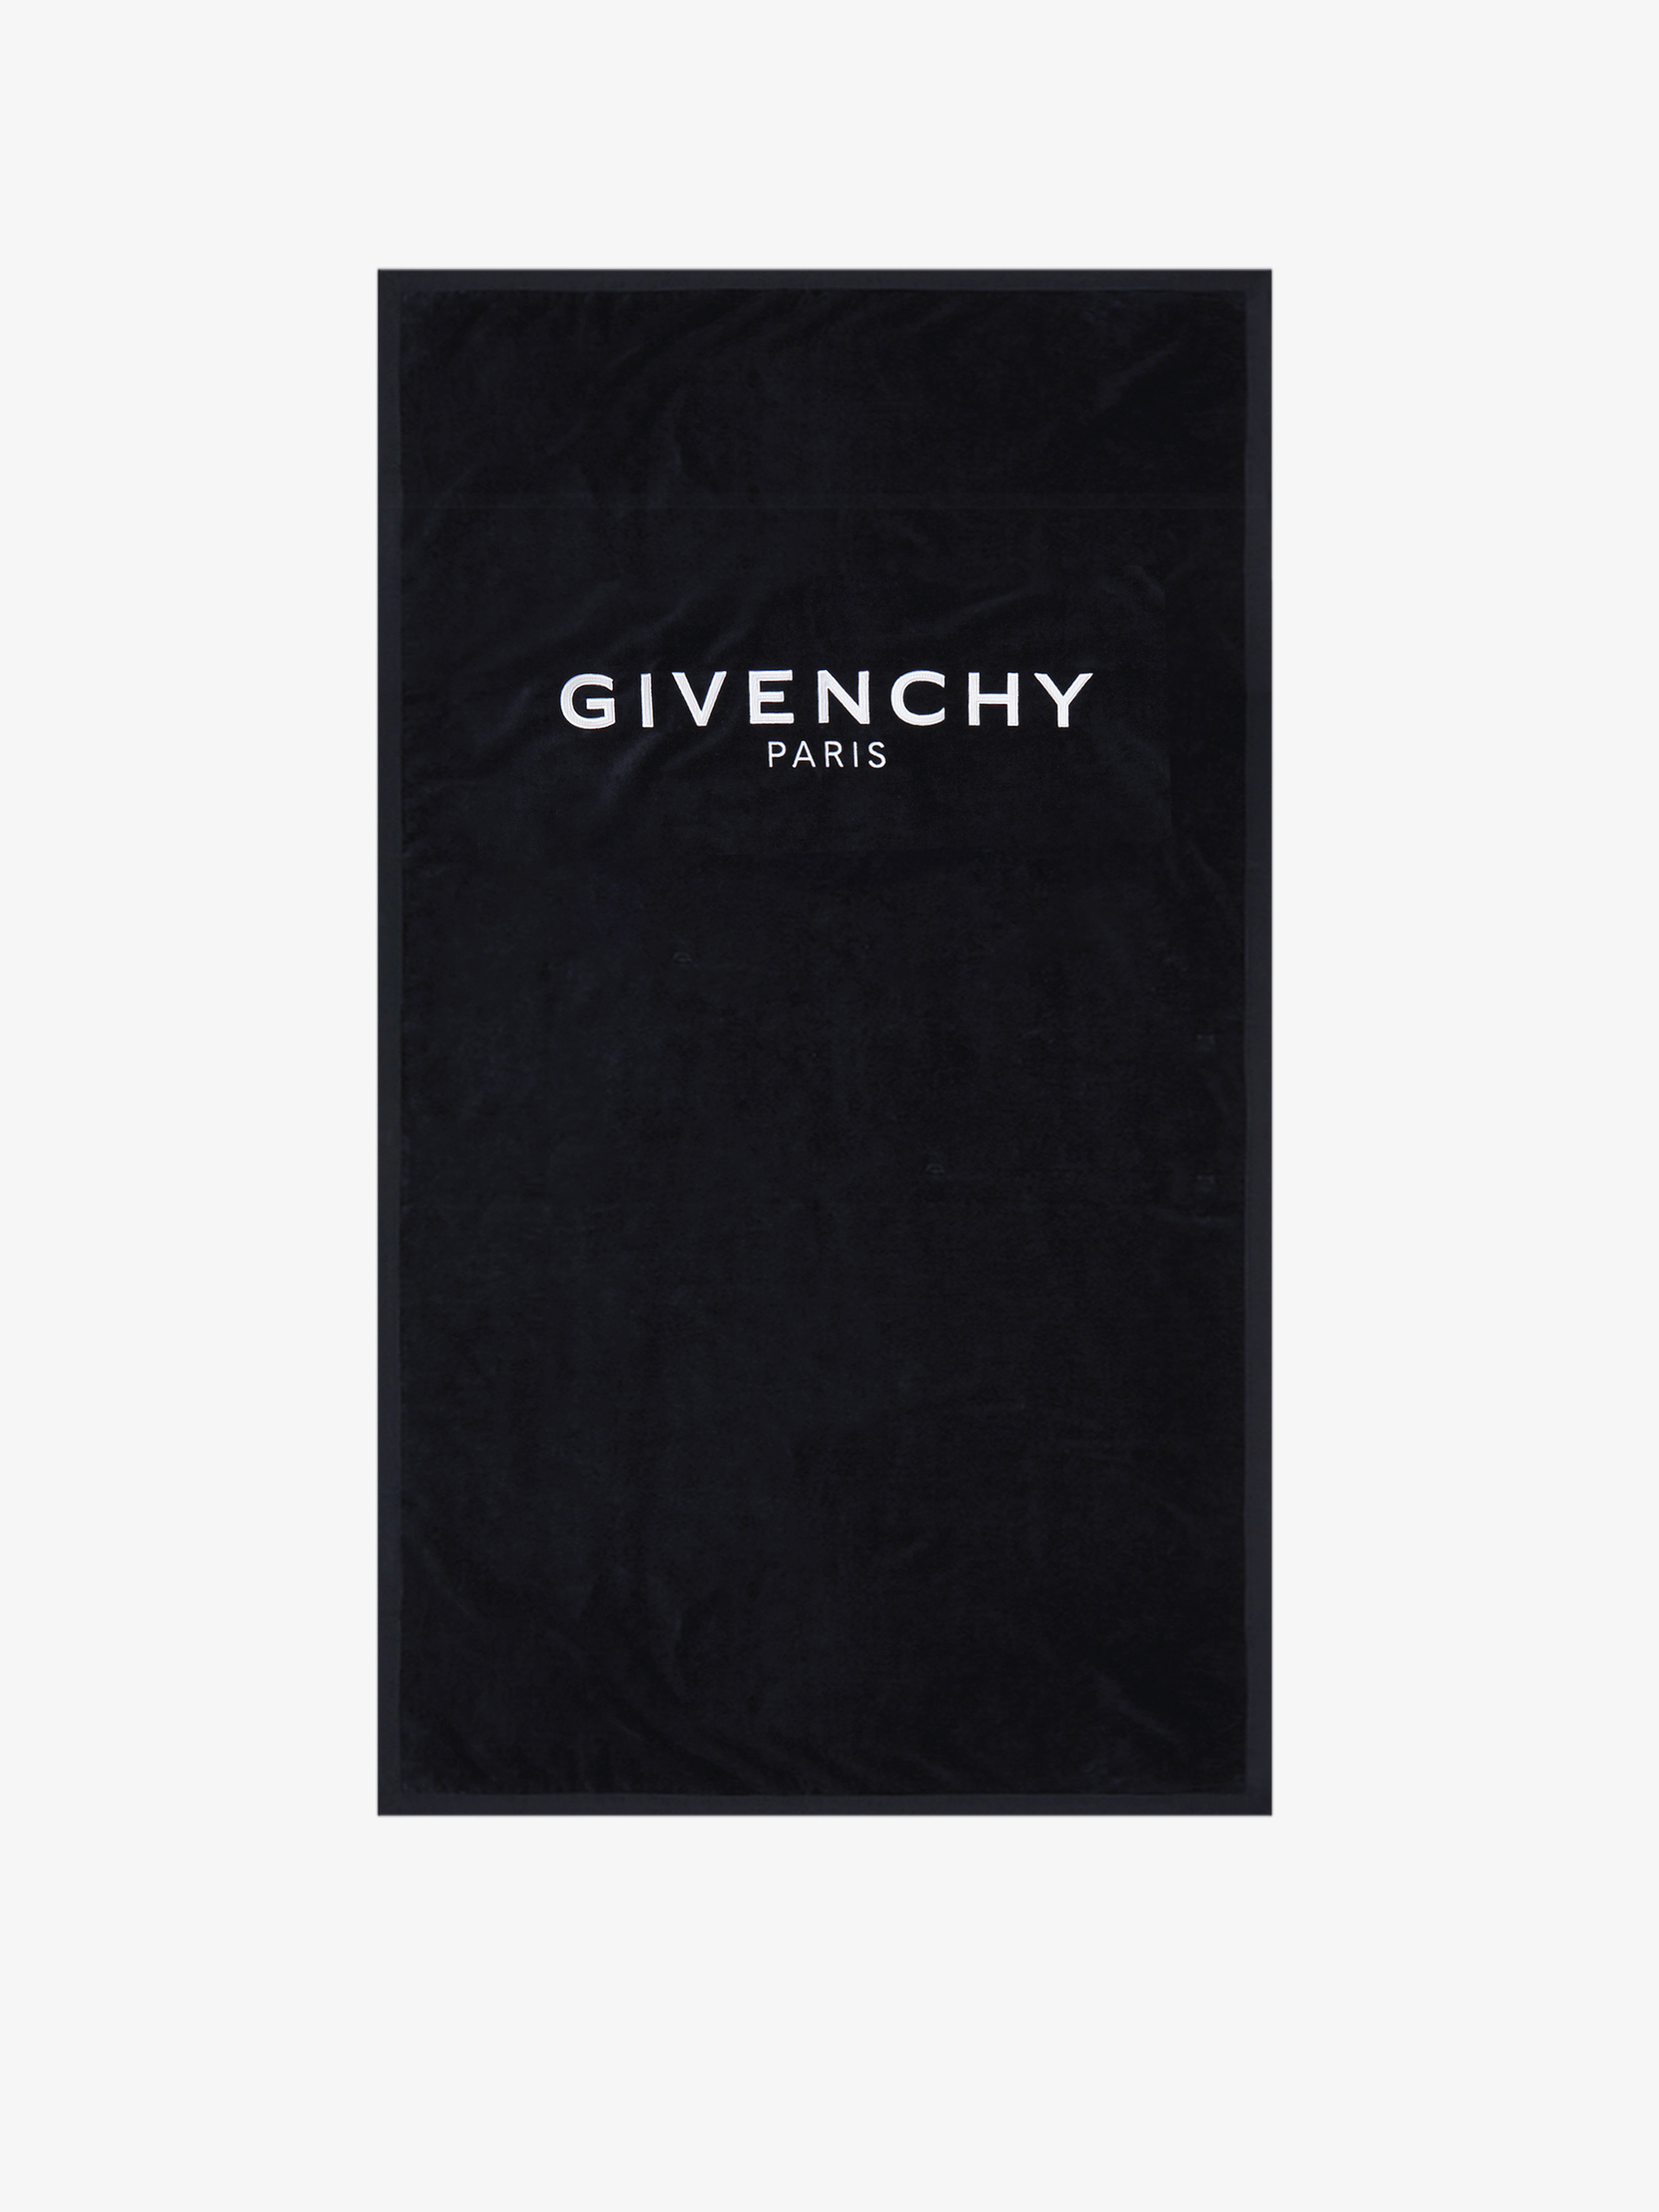 Givenchy Paris Beach Towel Givenchy Paris